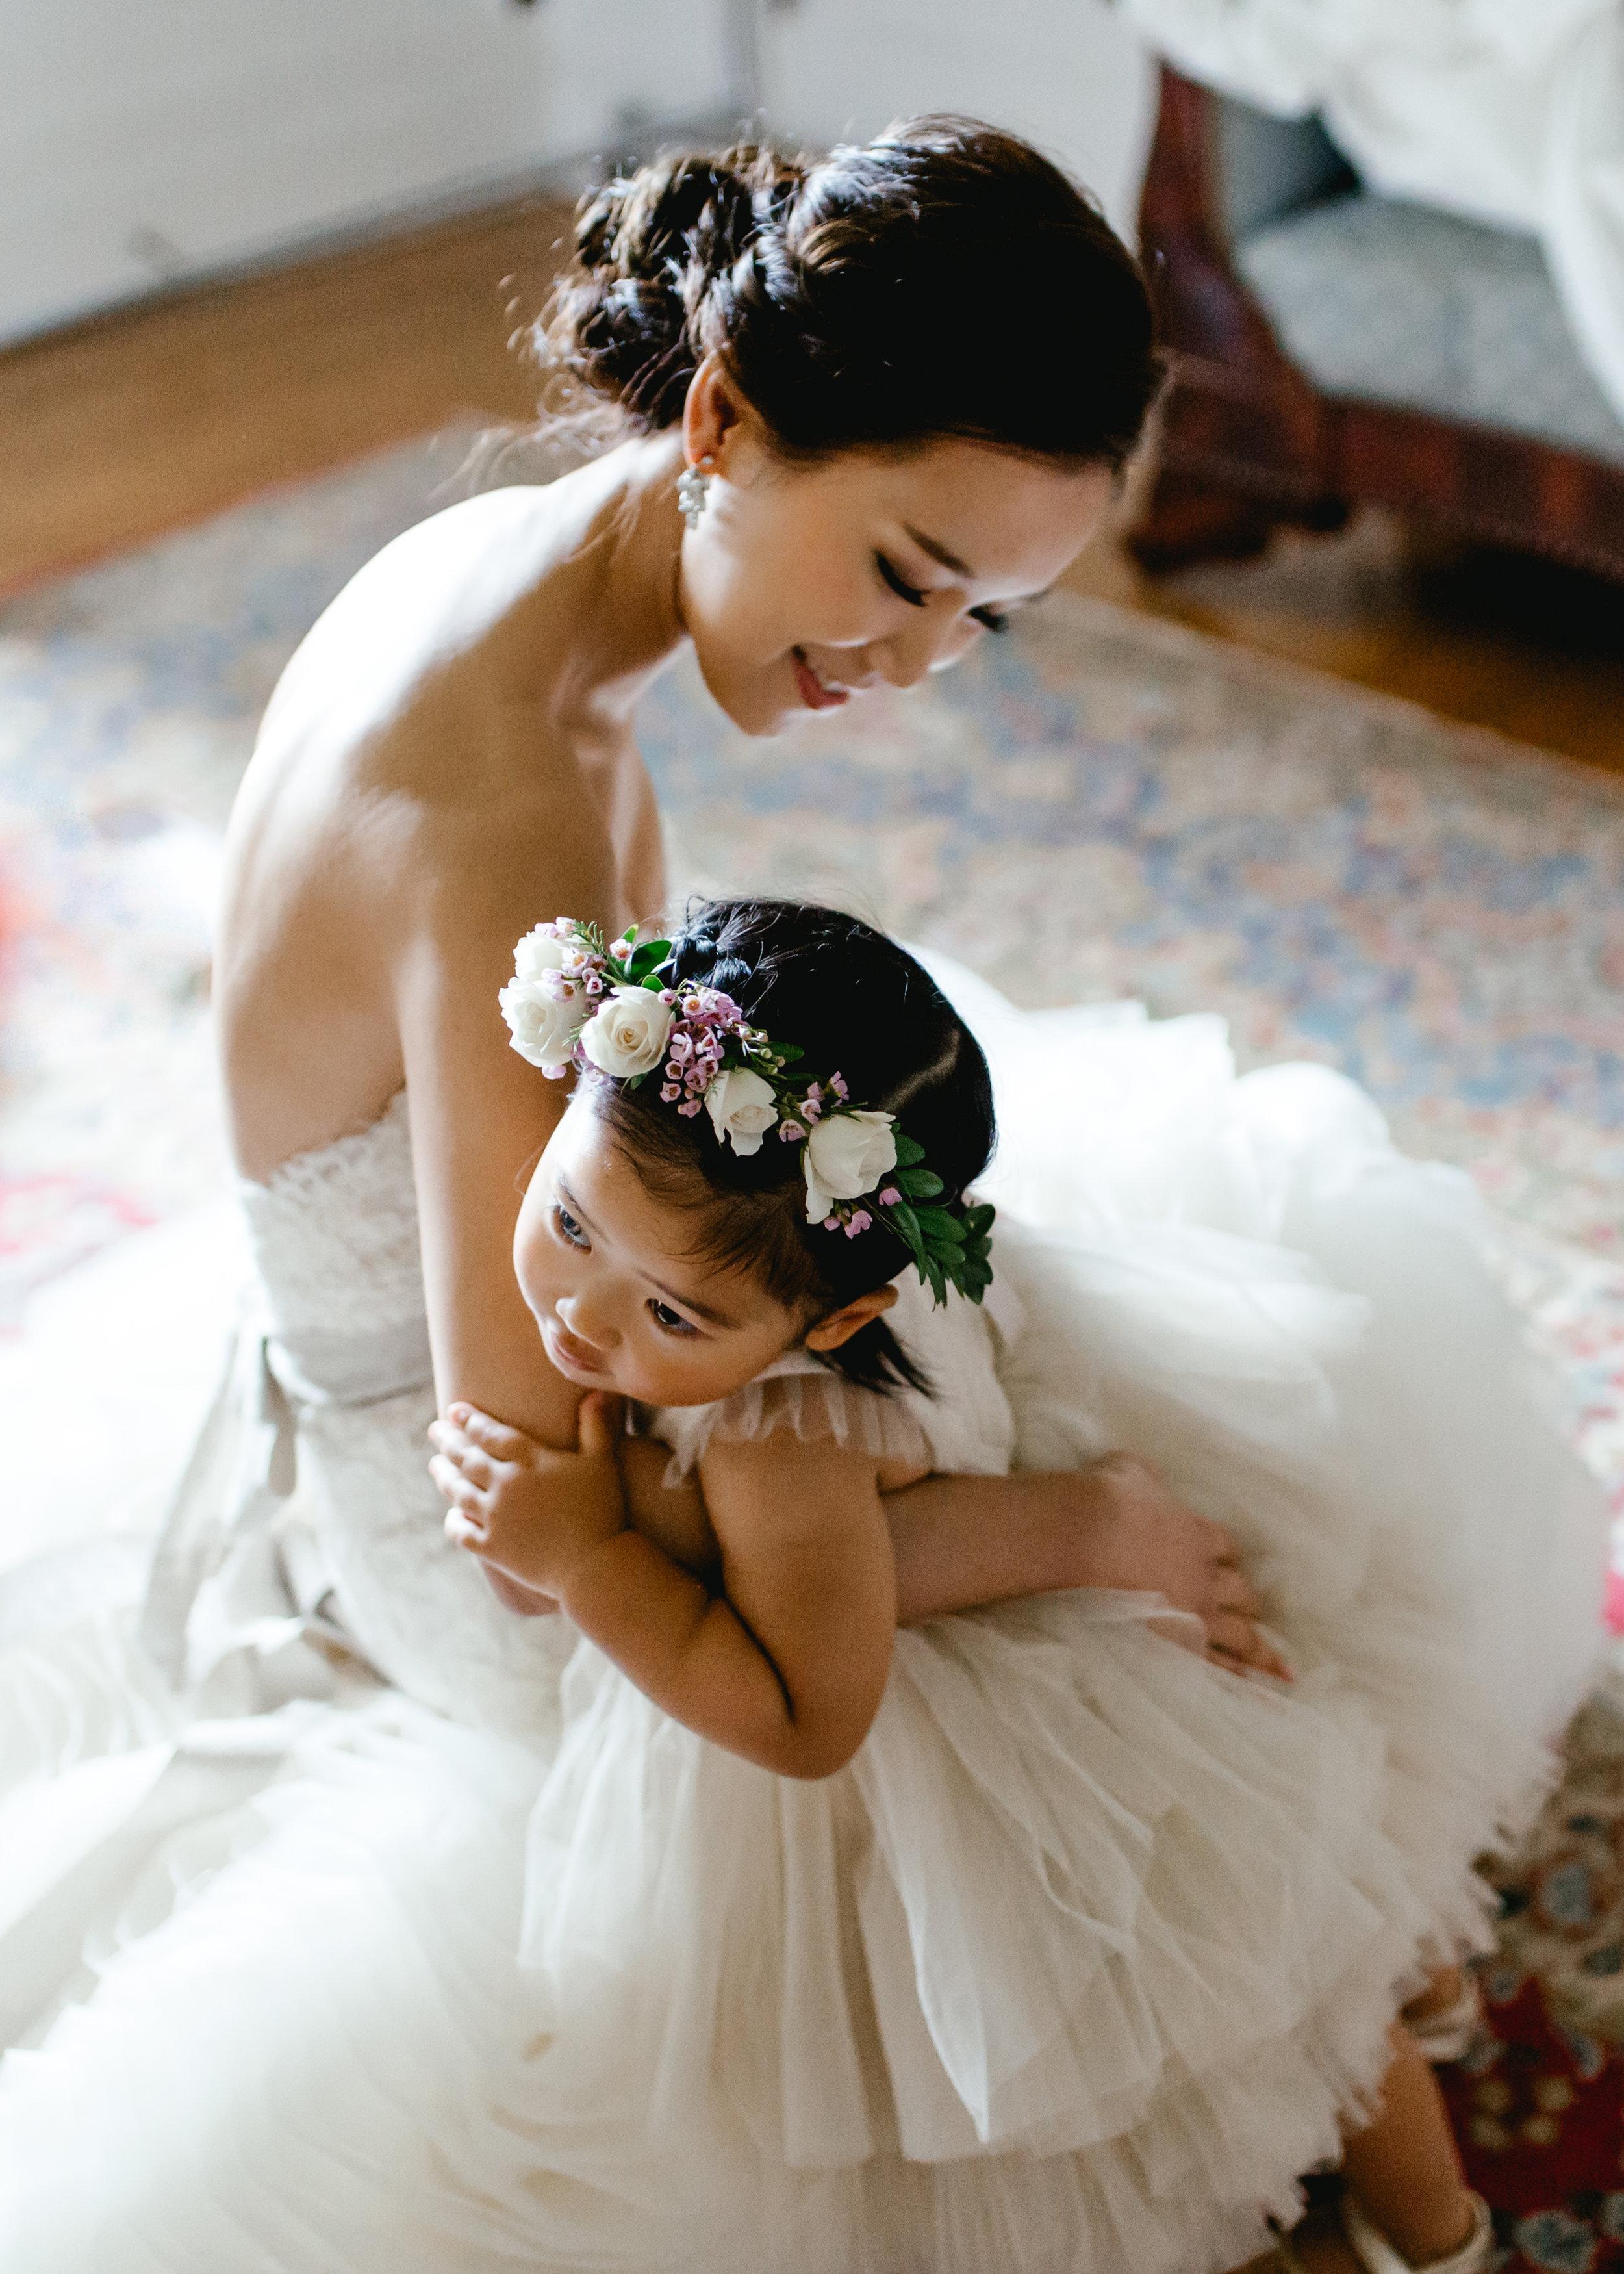 herafilms_wedding_sara_lei_hera_selects-19.jpg